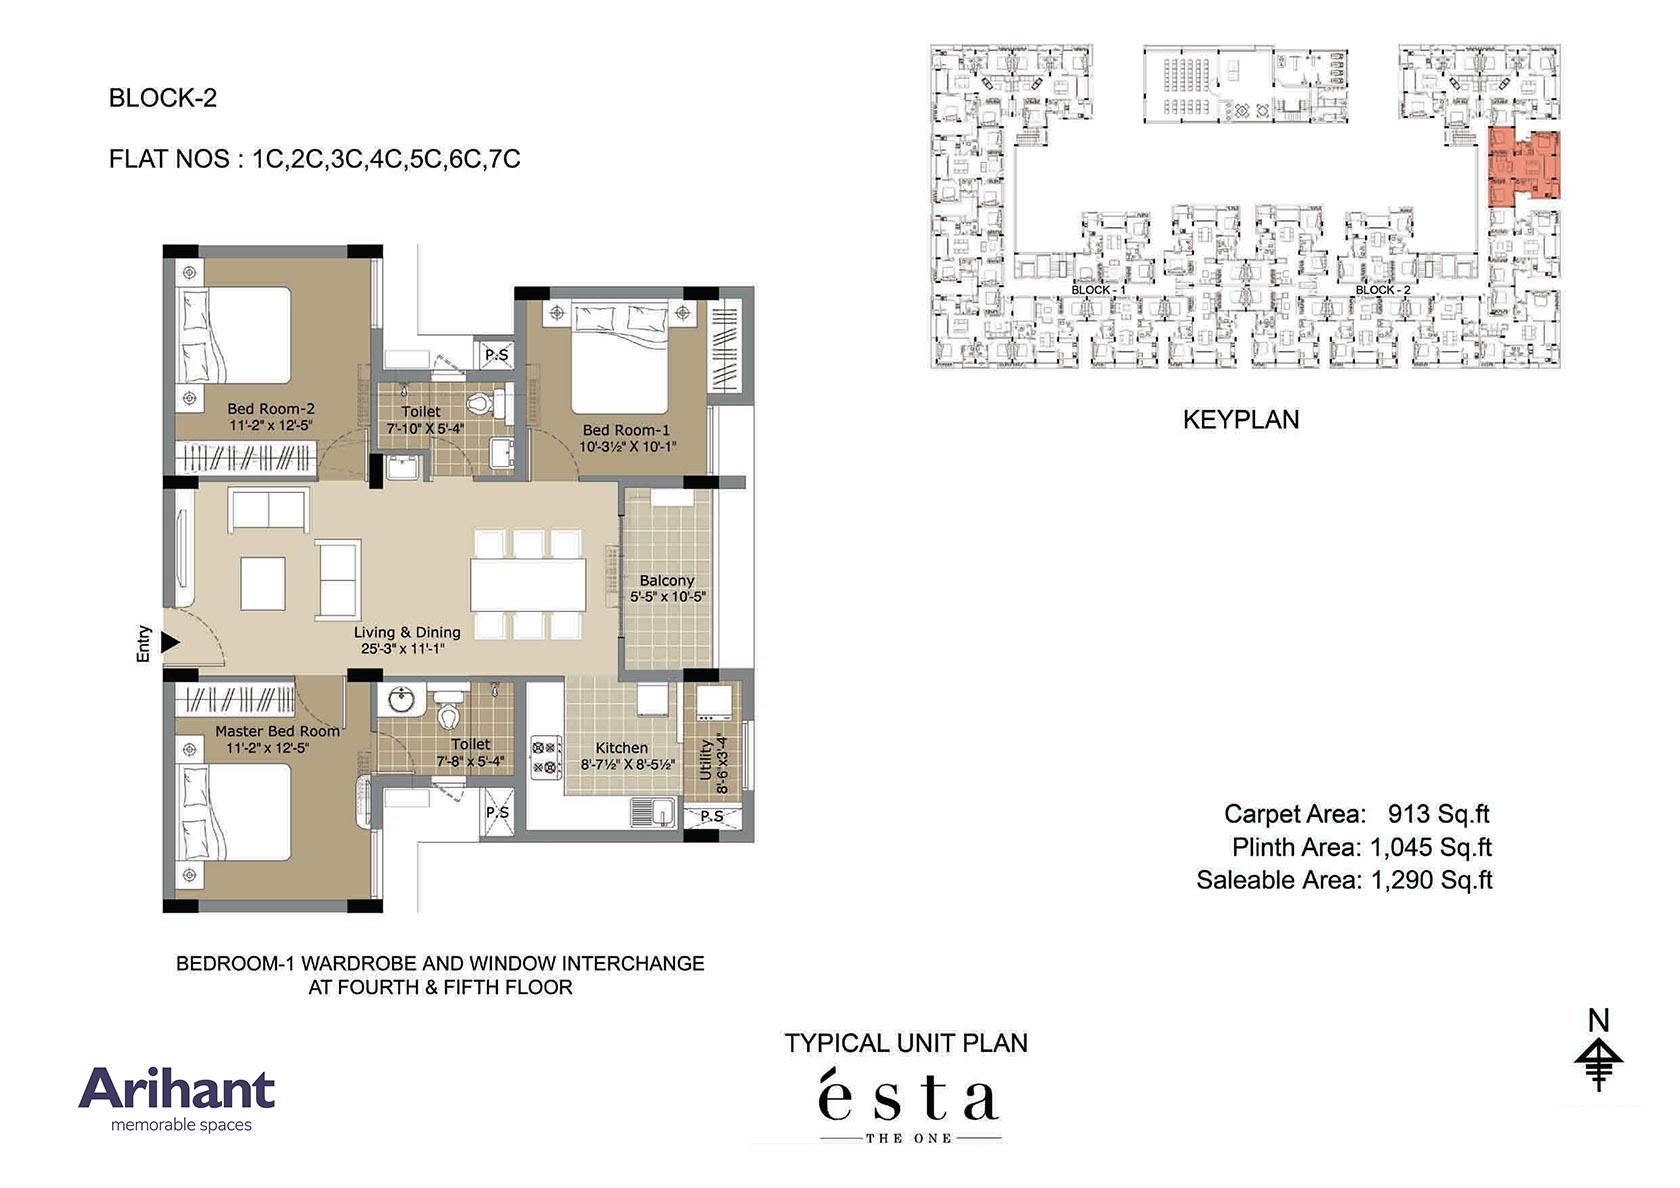 Arihant - Esta_Typical Unit Plan - Block 2 - Type C